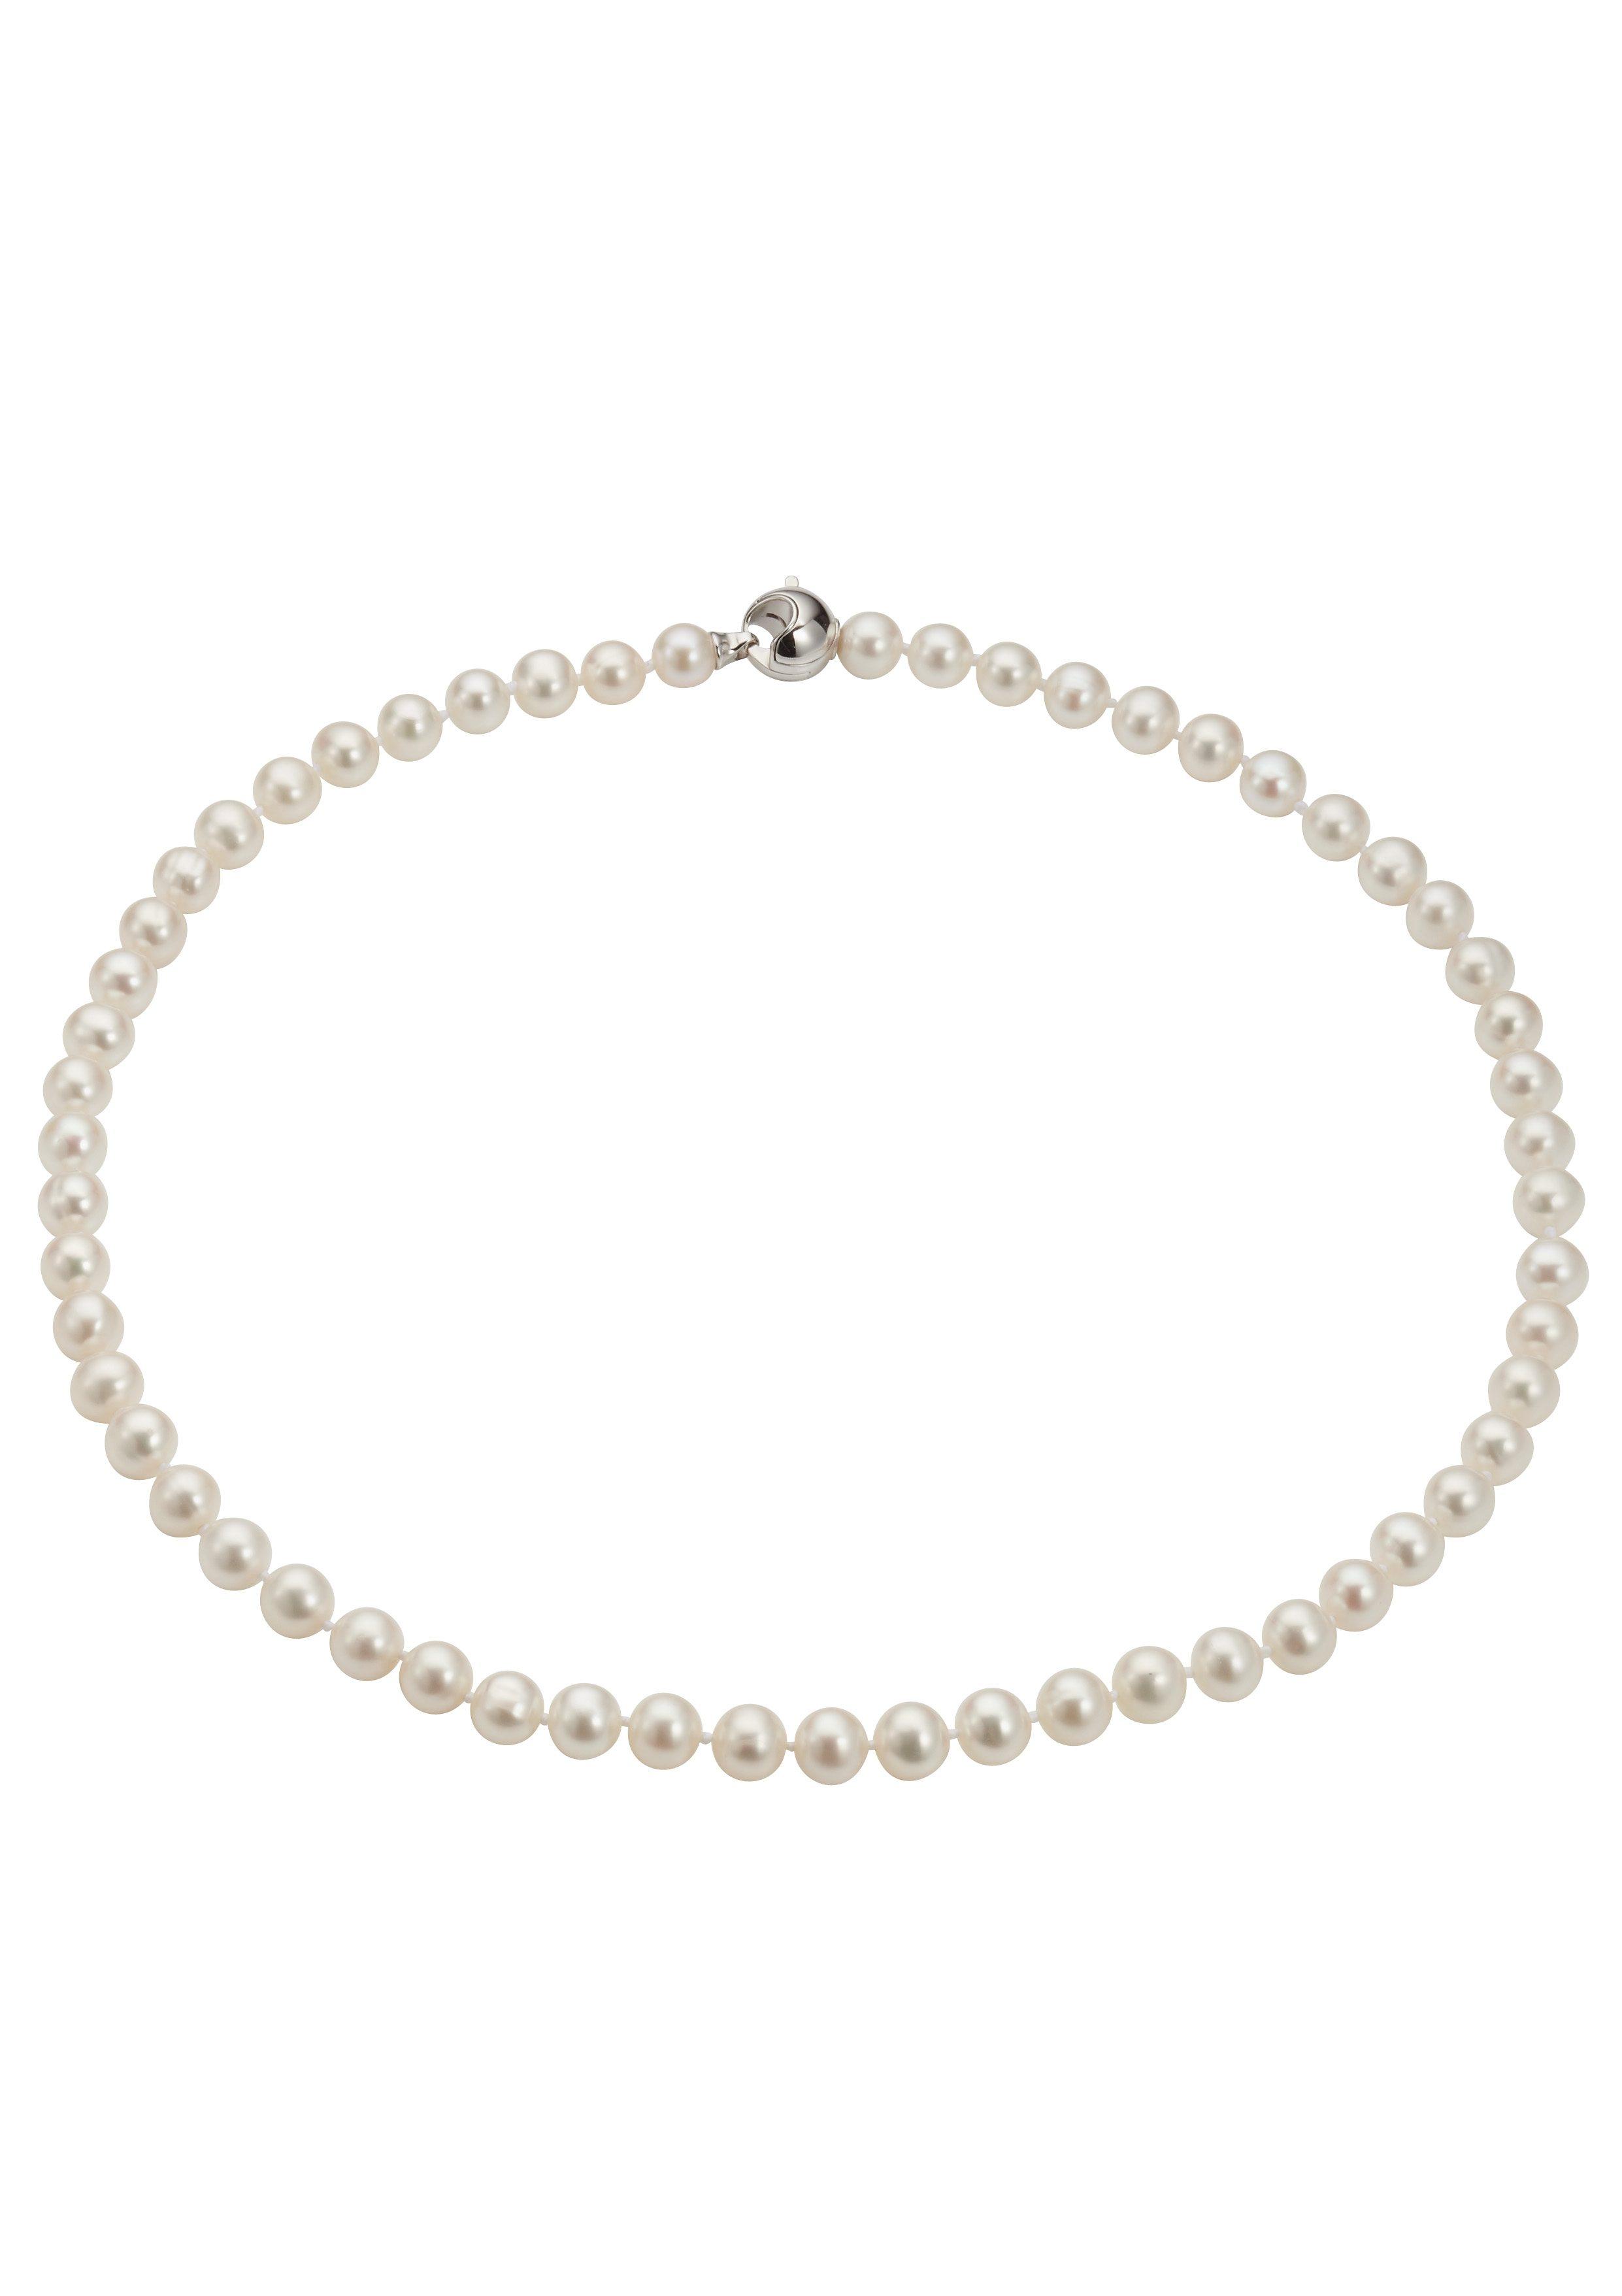 Adriana Perlenkette, »La mia perla A2839-KSW70-SIR/Ba«